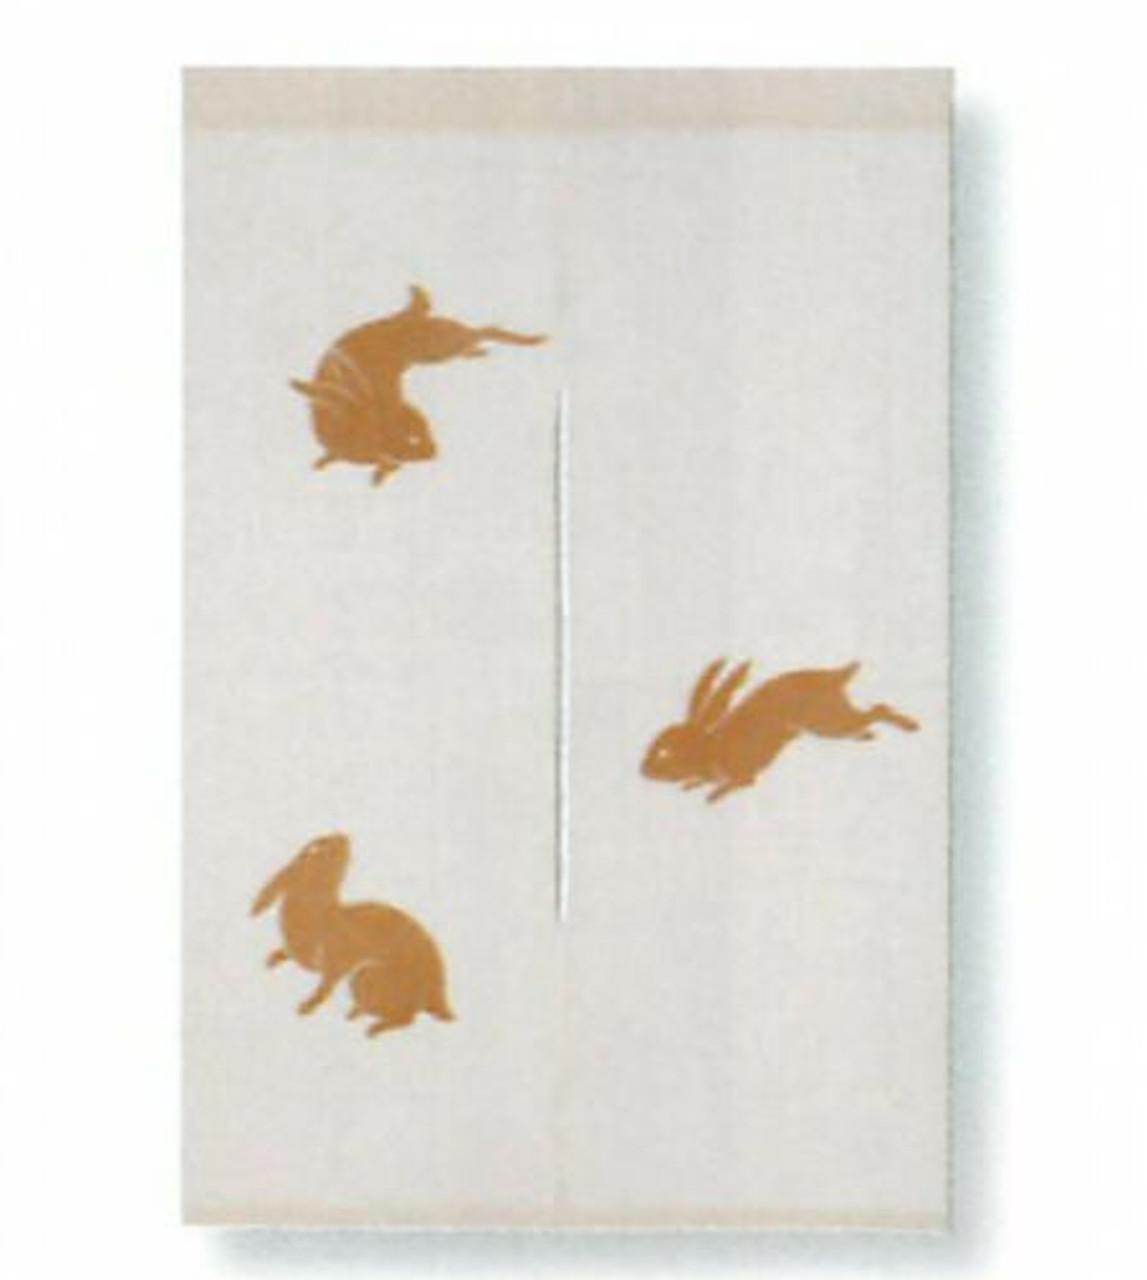 JAPANESE Noren Curtain NEW 85x150cm cotton BIRD MADE IN JAPAN